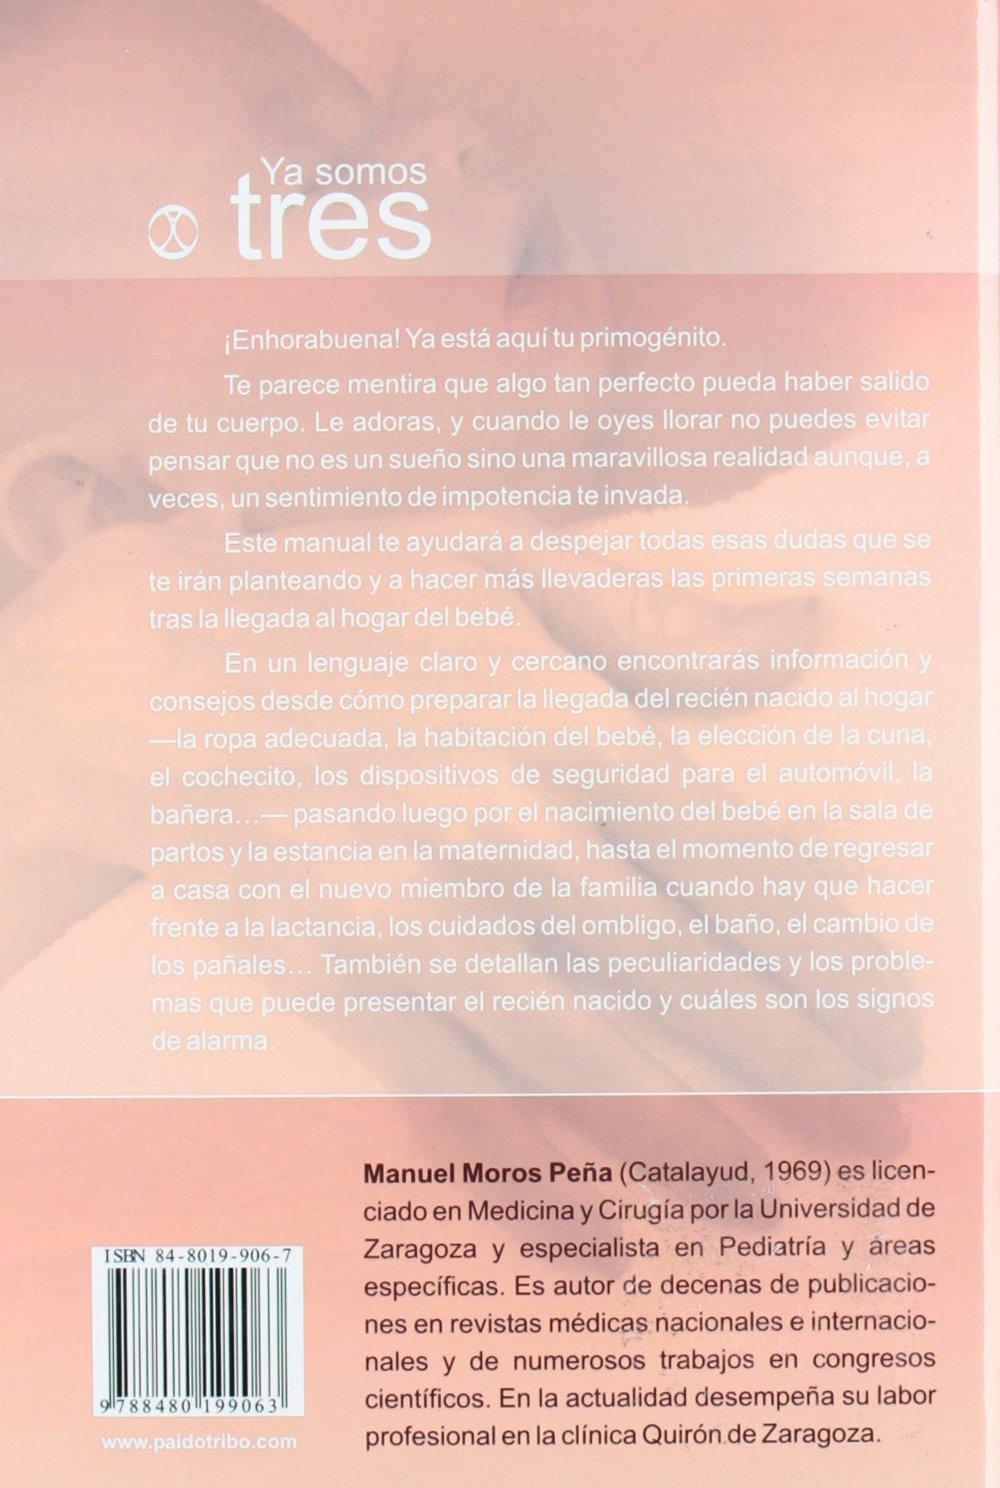 Ya somos tres (Spanish Edition): Manuel Moros Pena, Angeles Tome, Manuel Moros, Carlos Gallego: 9788480199063: Amazon.com: Books